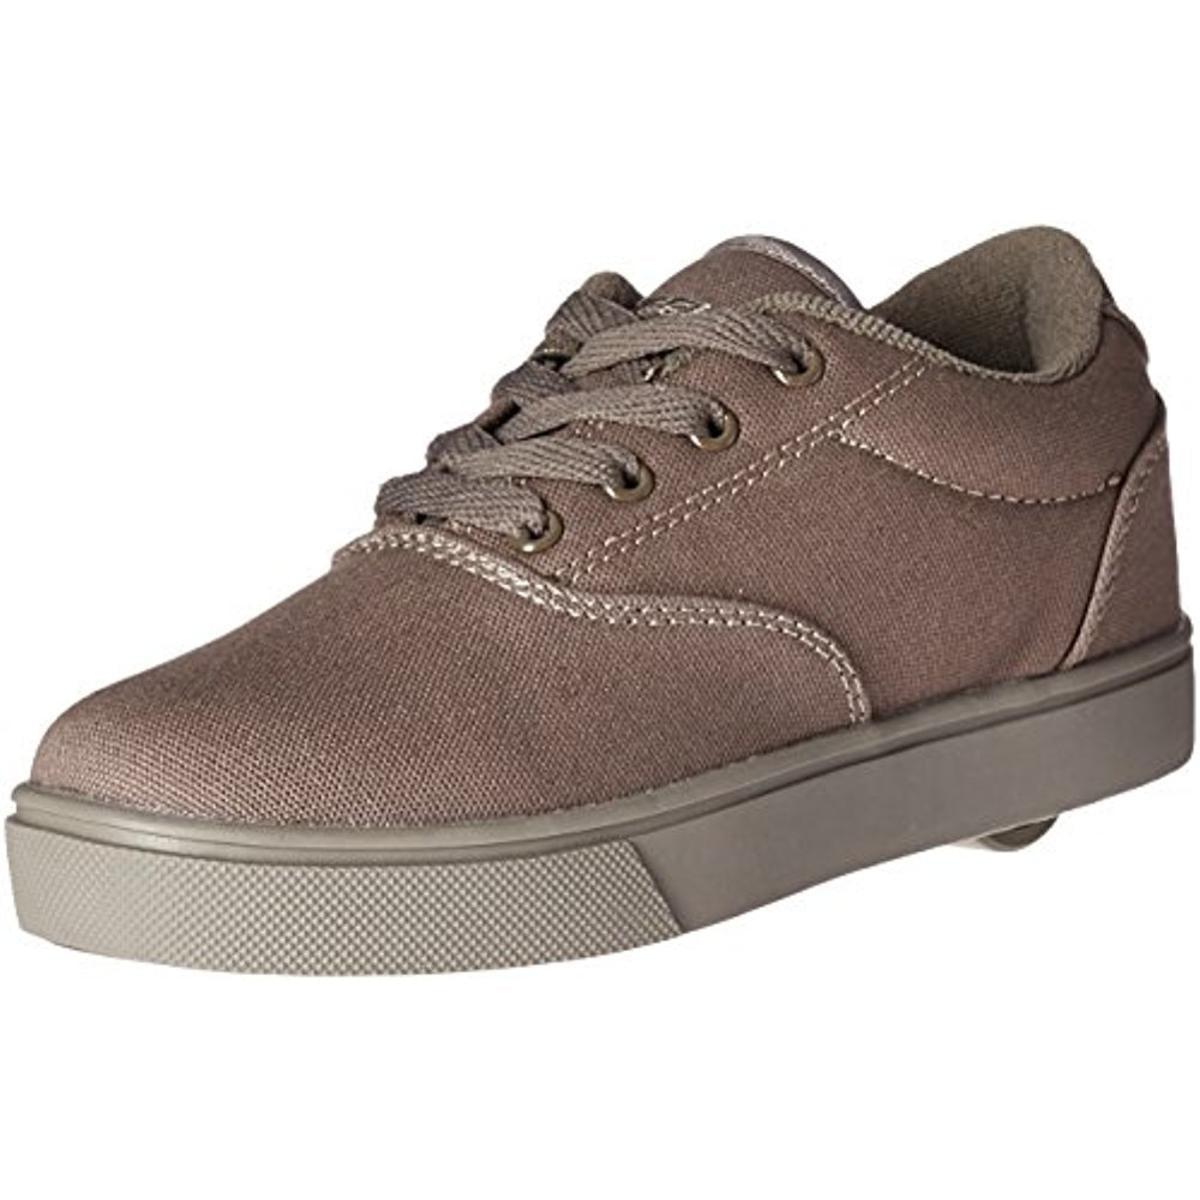 Heelys Boys Launch Canvas Skate Shoes by Heelys